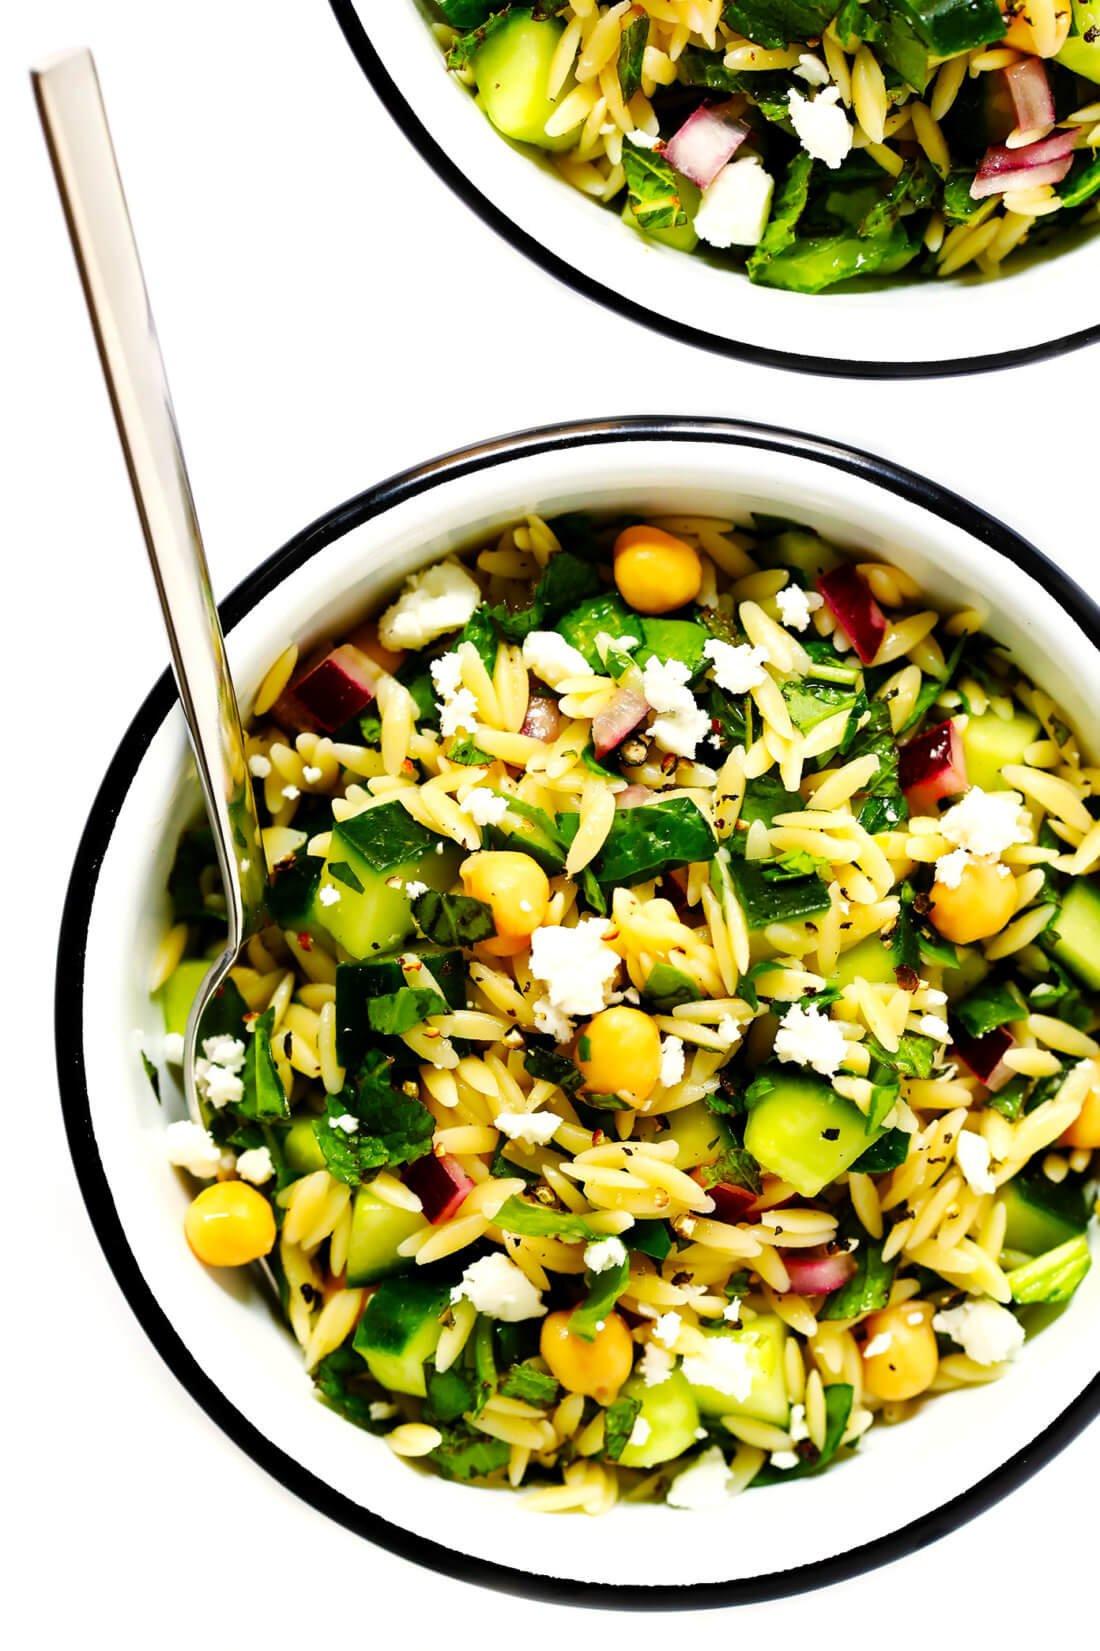 Lemon Orzo Chickpea Pasta Salad Recipe